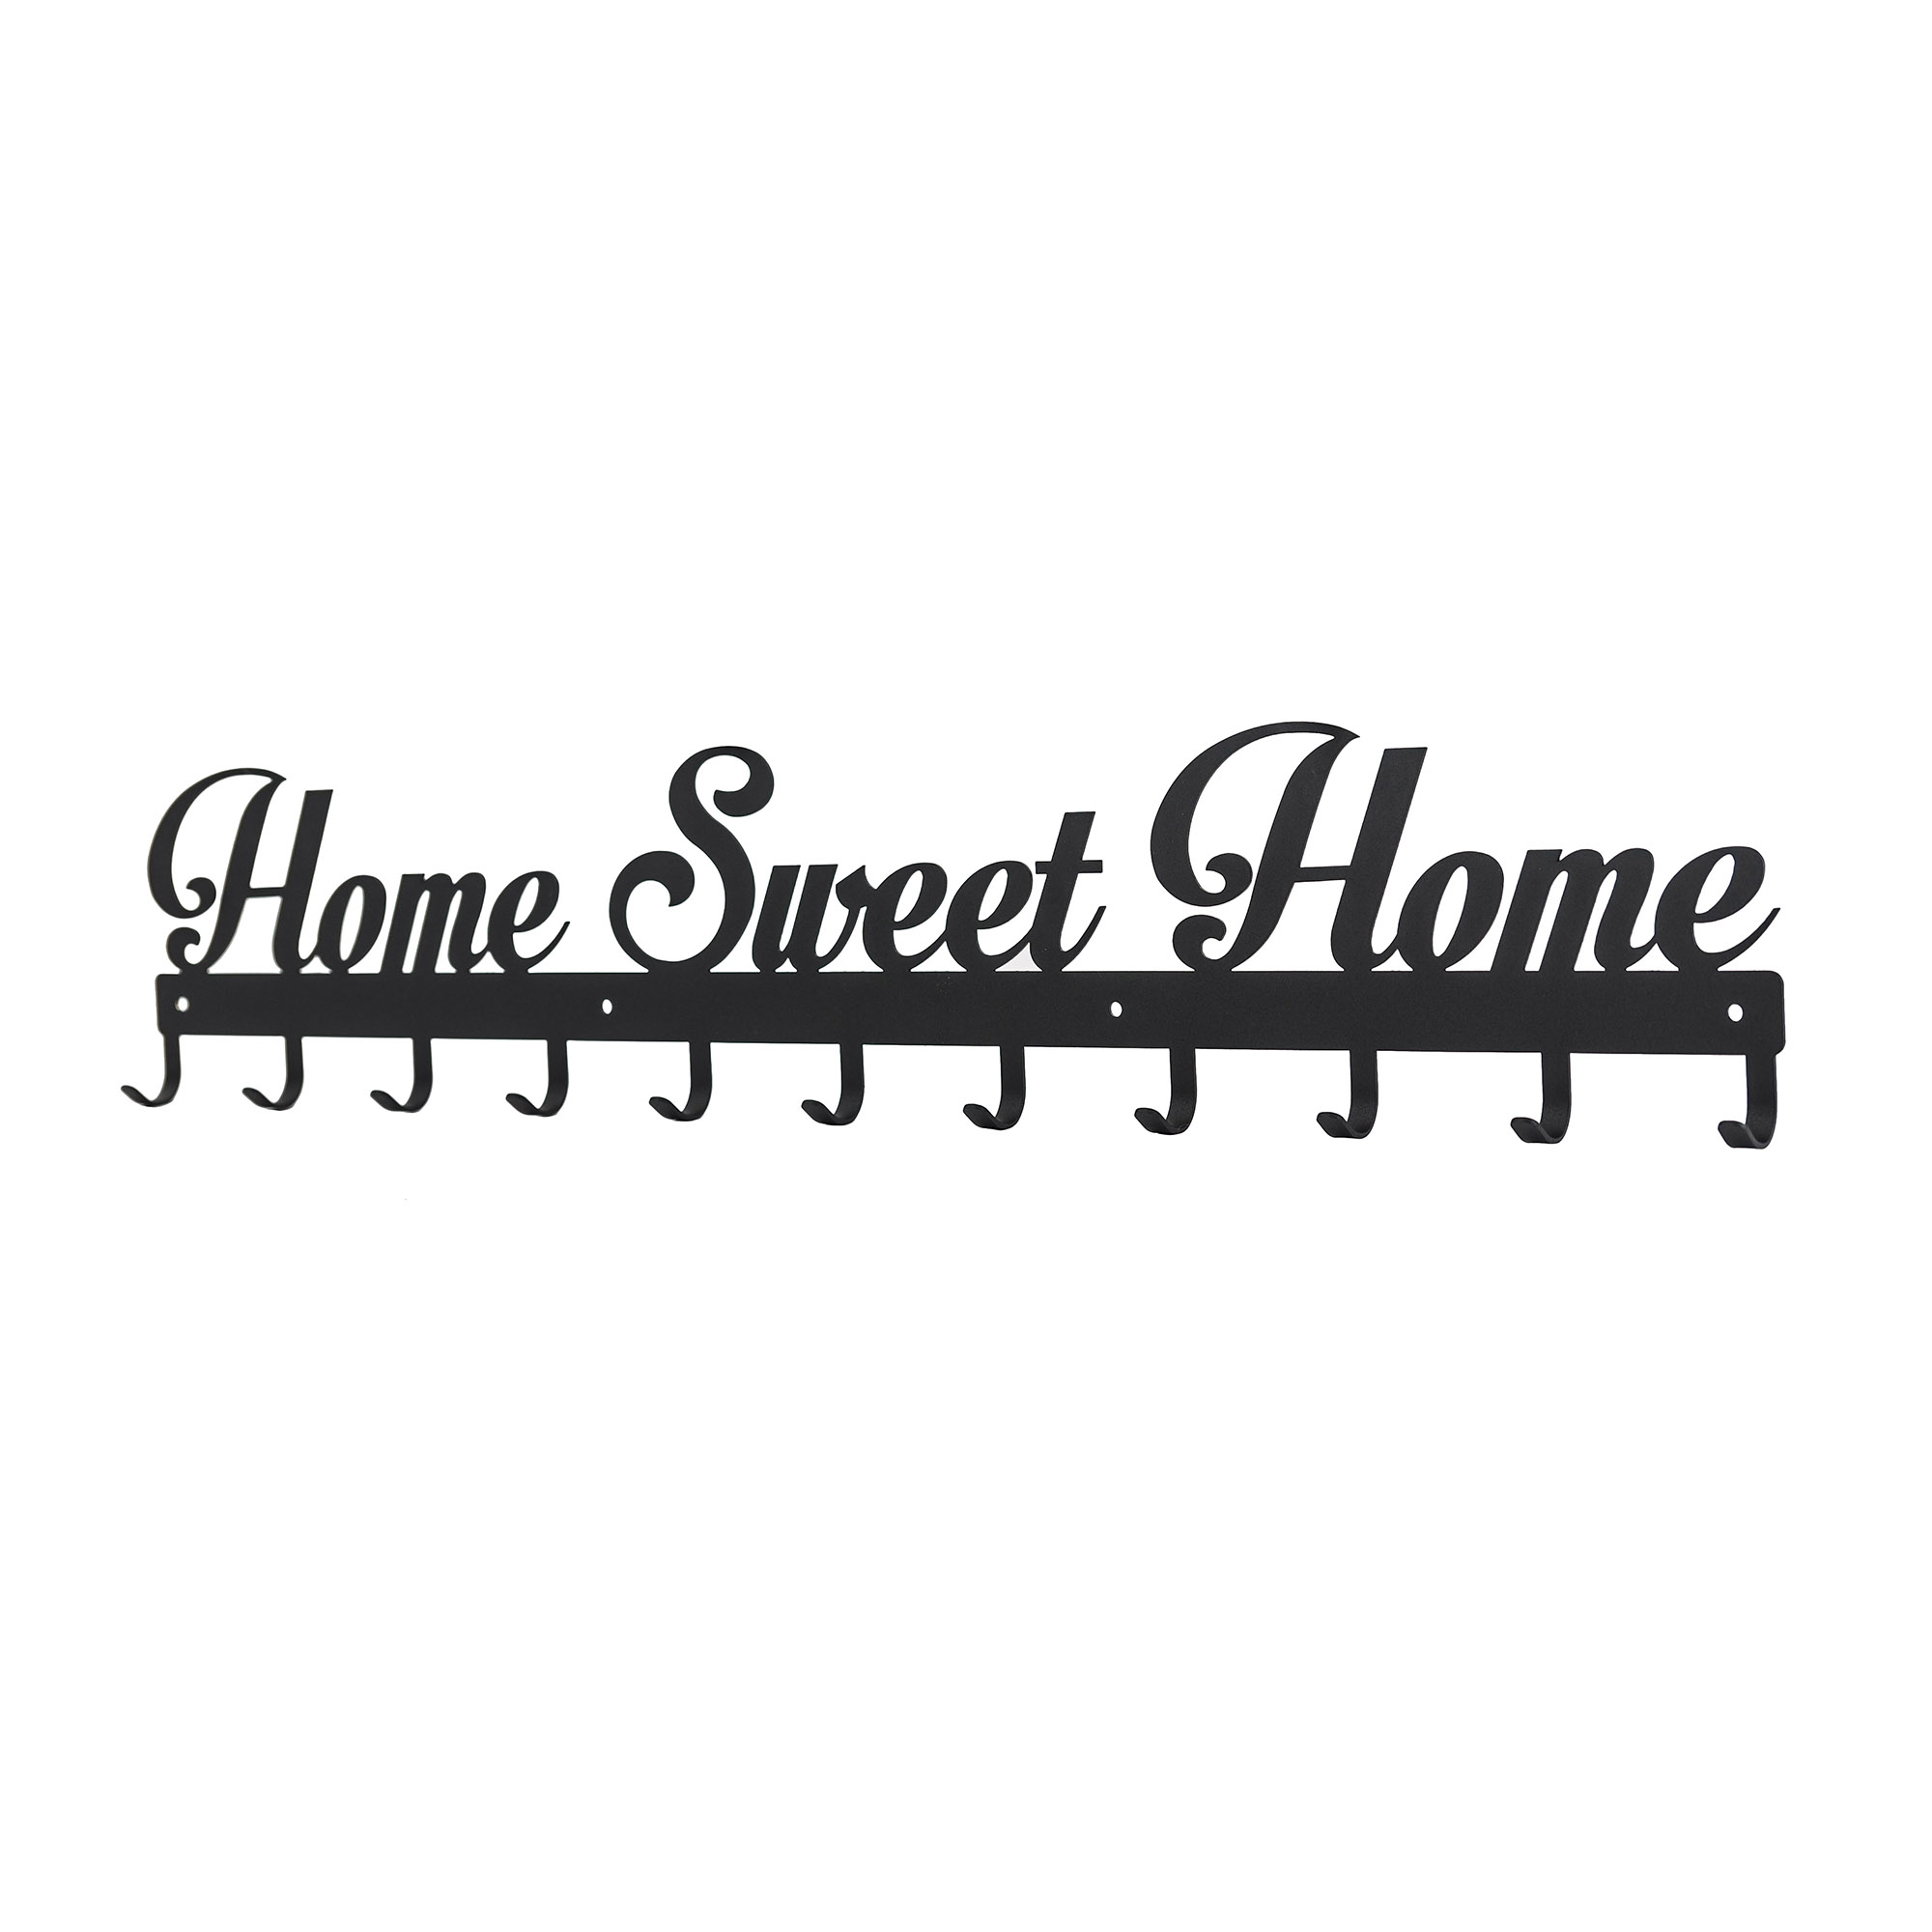 Kleiderhaken Home Sweet Home 80 Breit Garderobe Hakenleiste Edelstahl Schlüssel